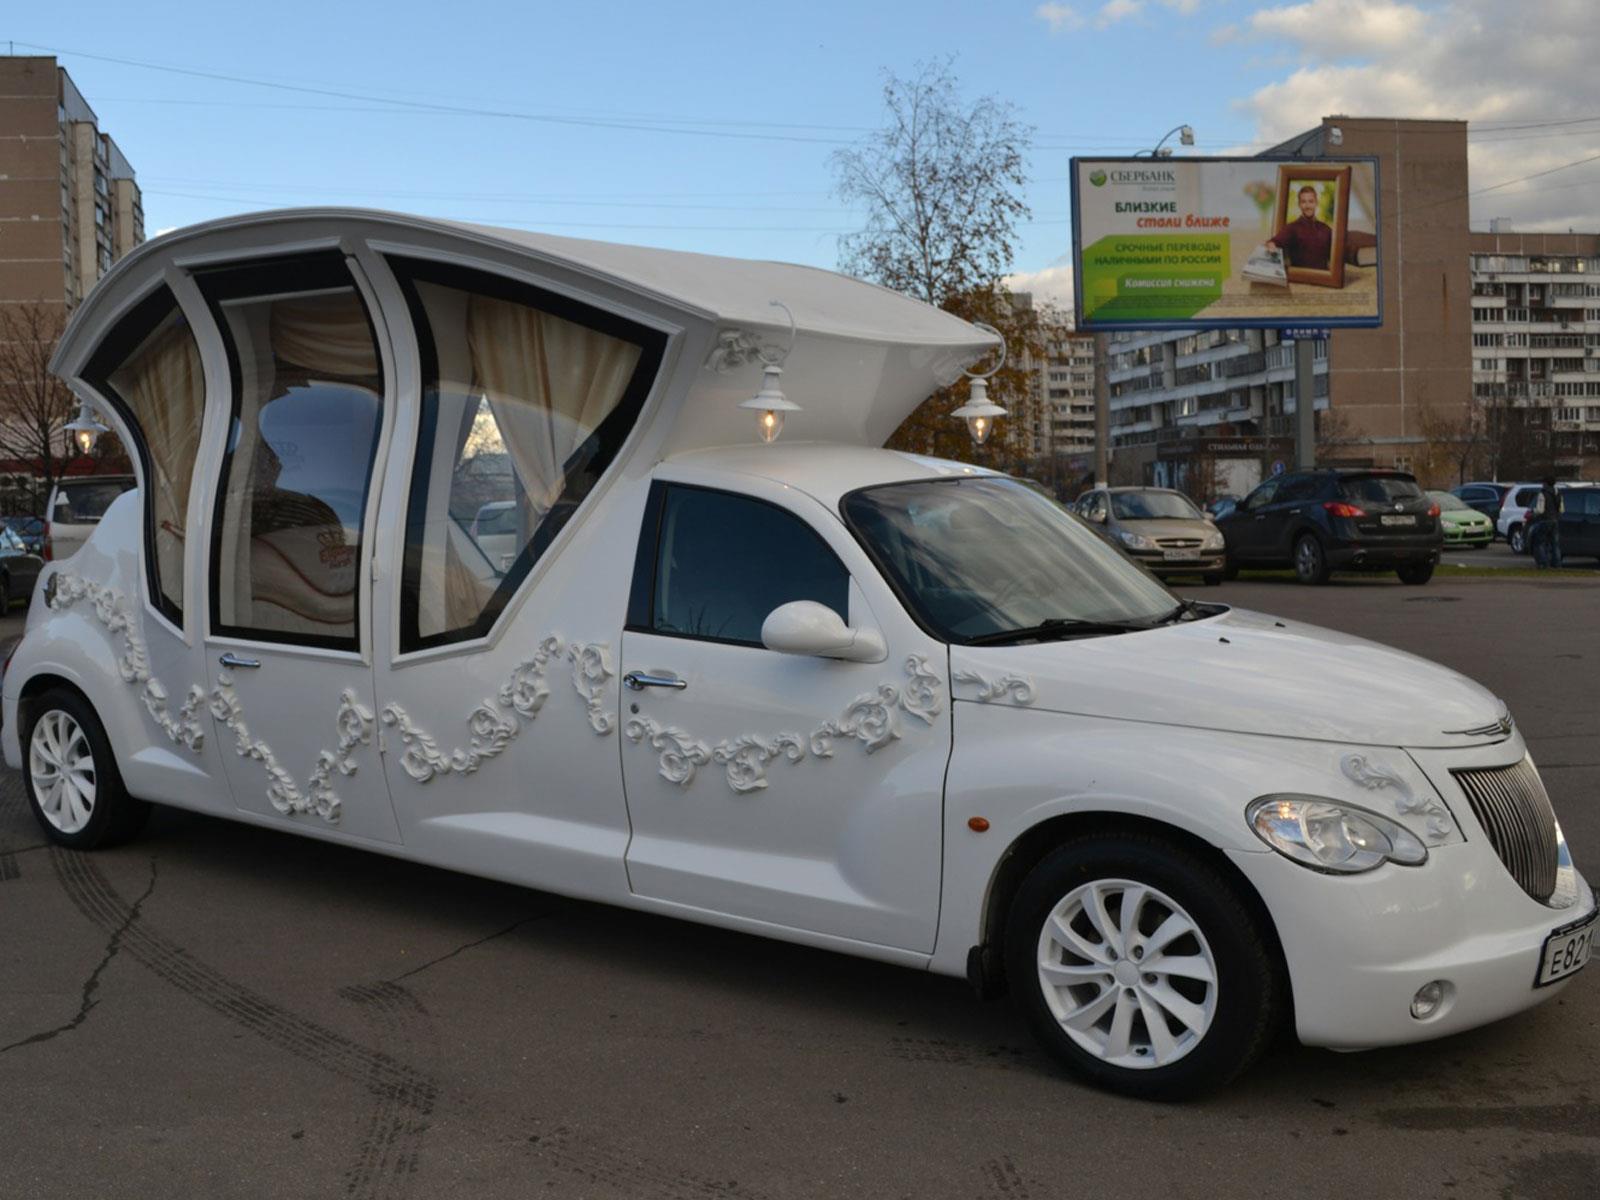 chrysler p t cruiser se transforma en limusina. Black Bedroom Furniture Sets. Home Design Ideas